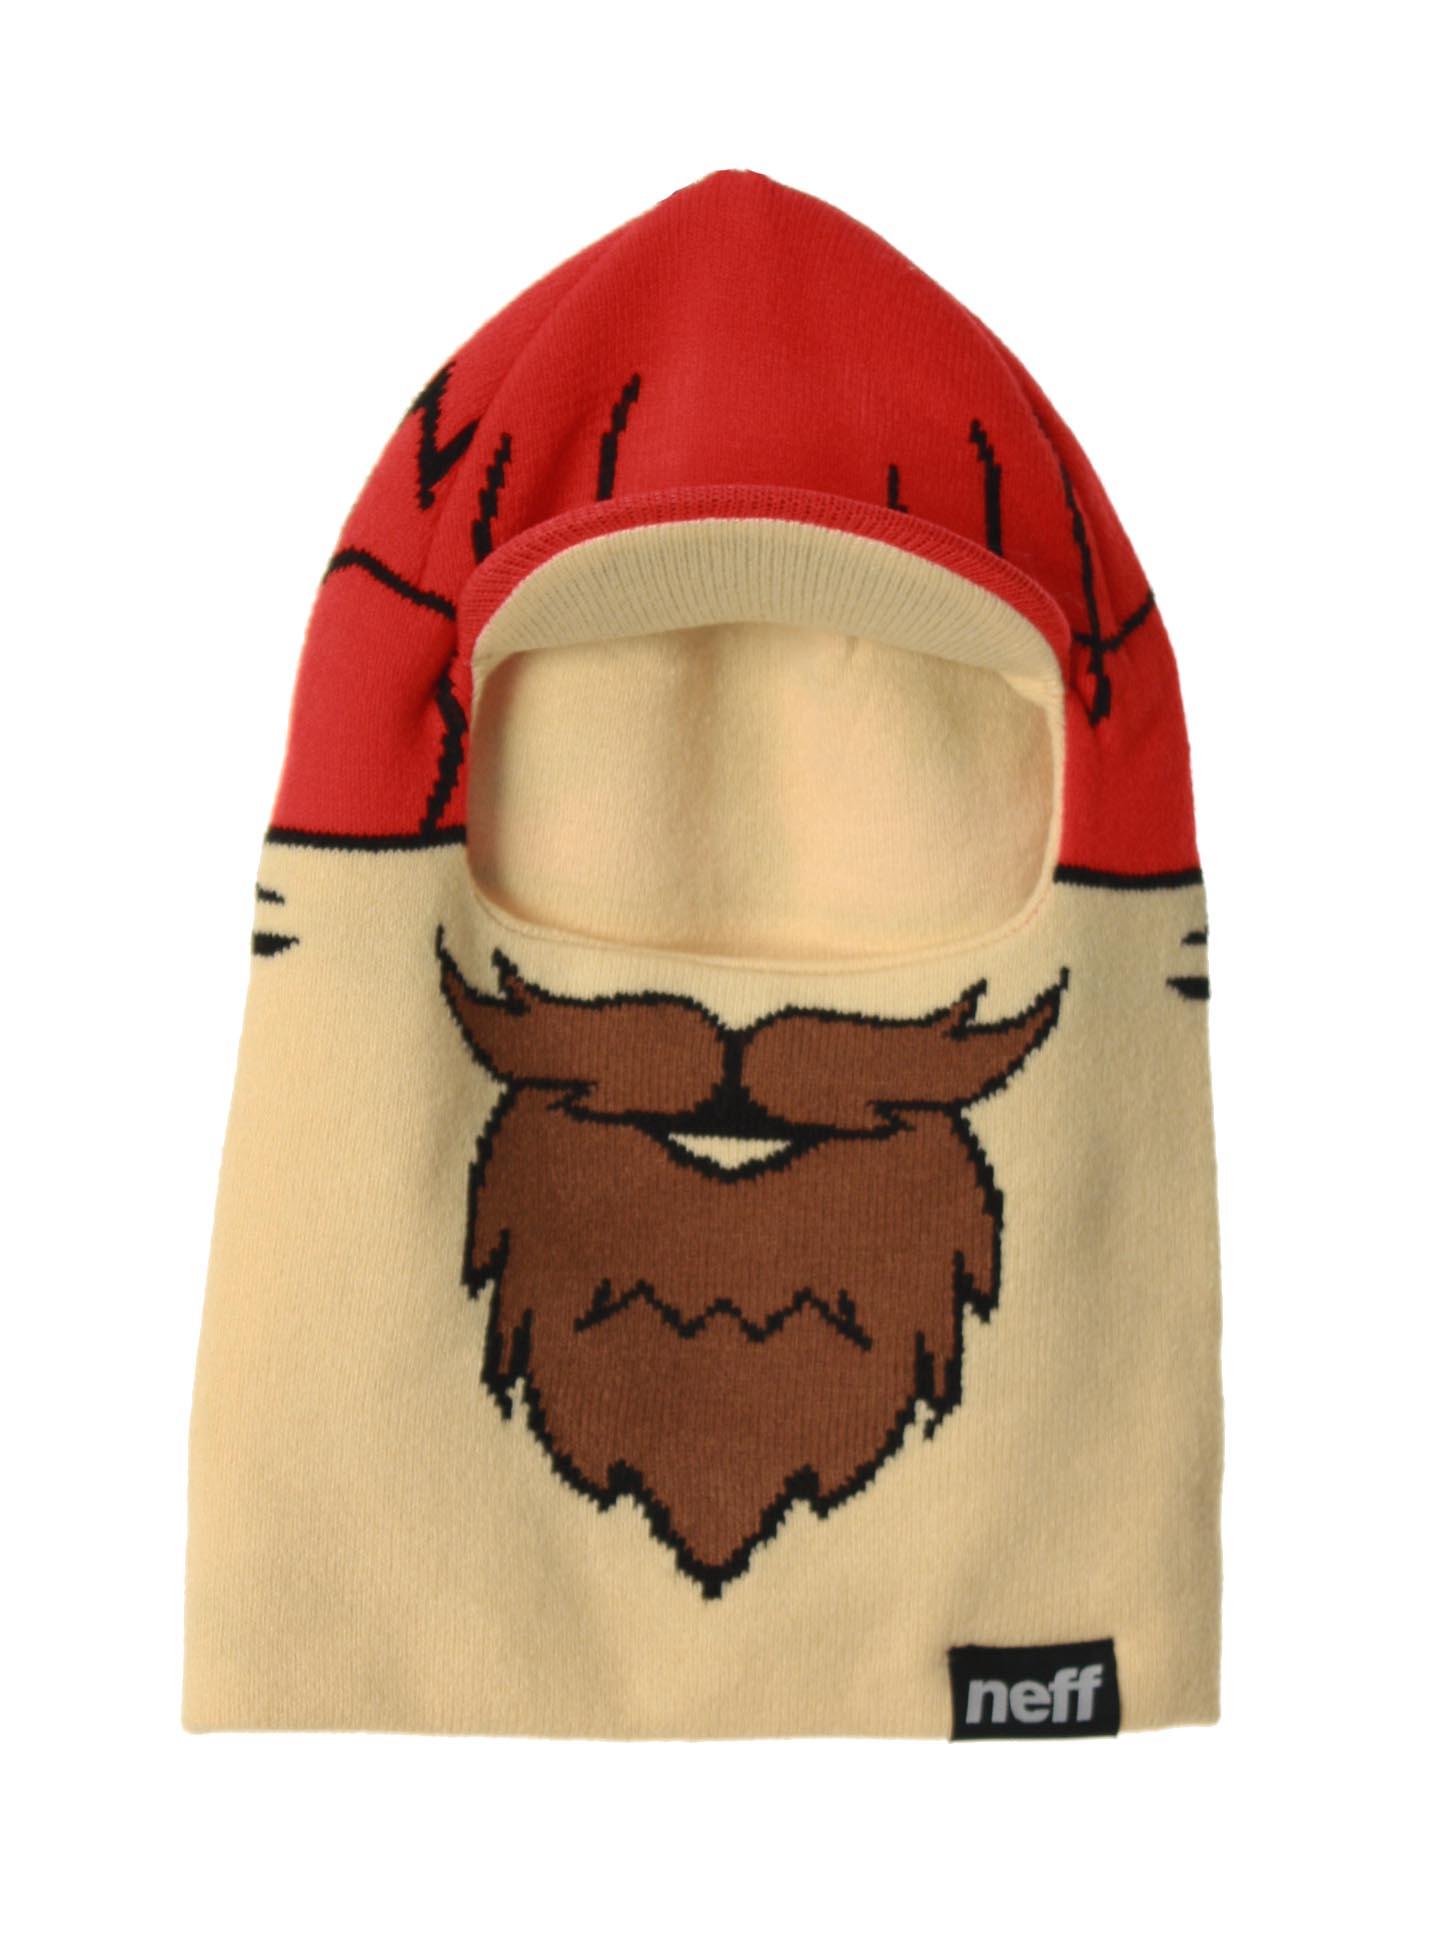 NEFF Headwear Unisex Full Visor Bearded Lumberjack Beanie Mask at Sears.com